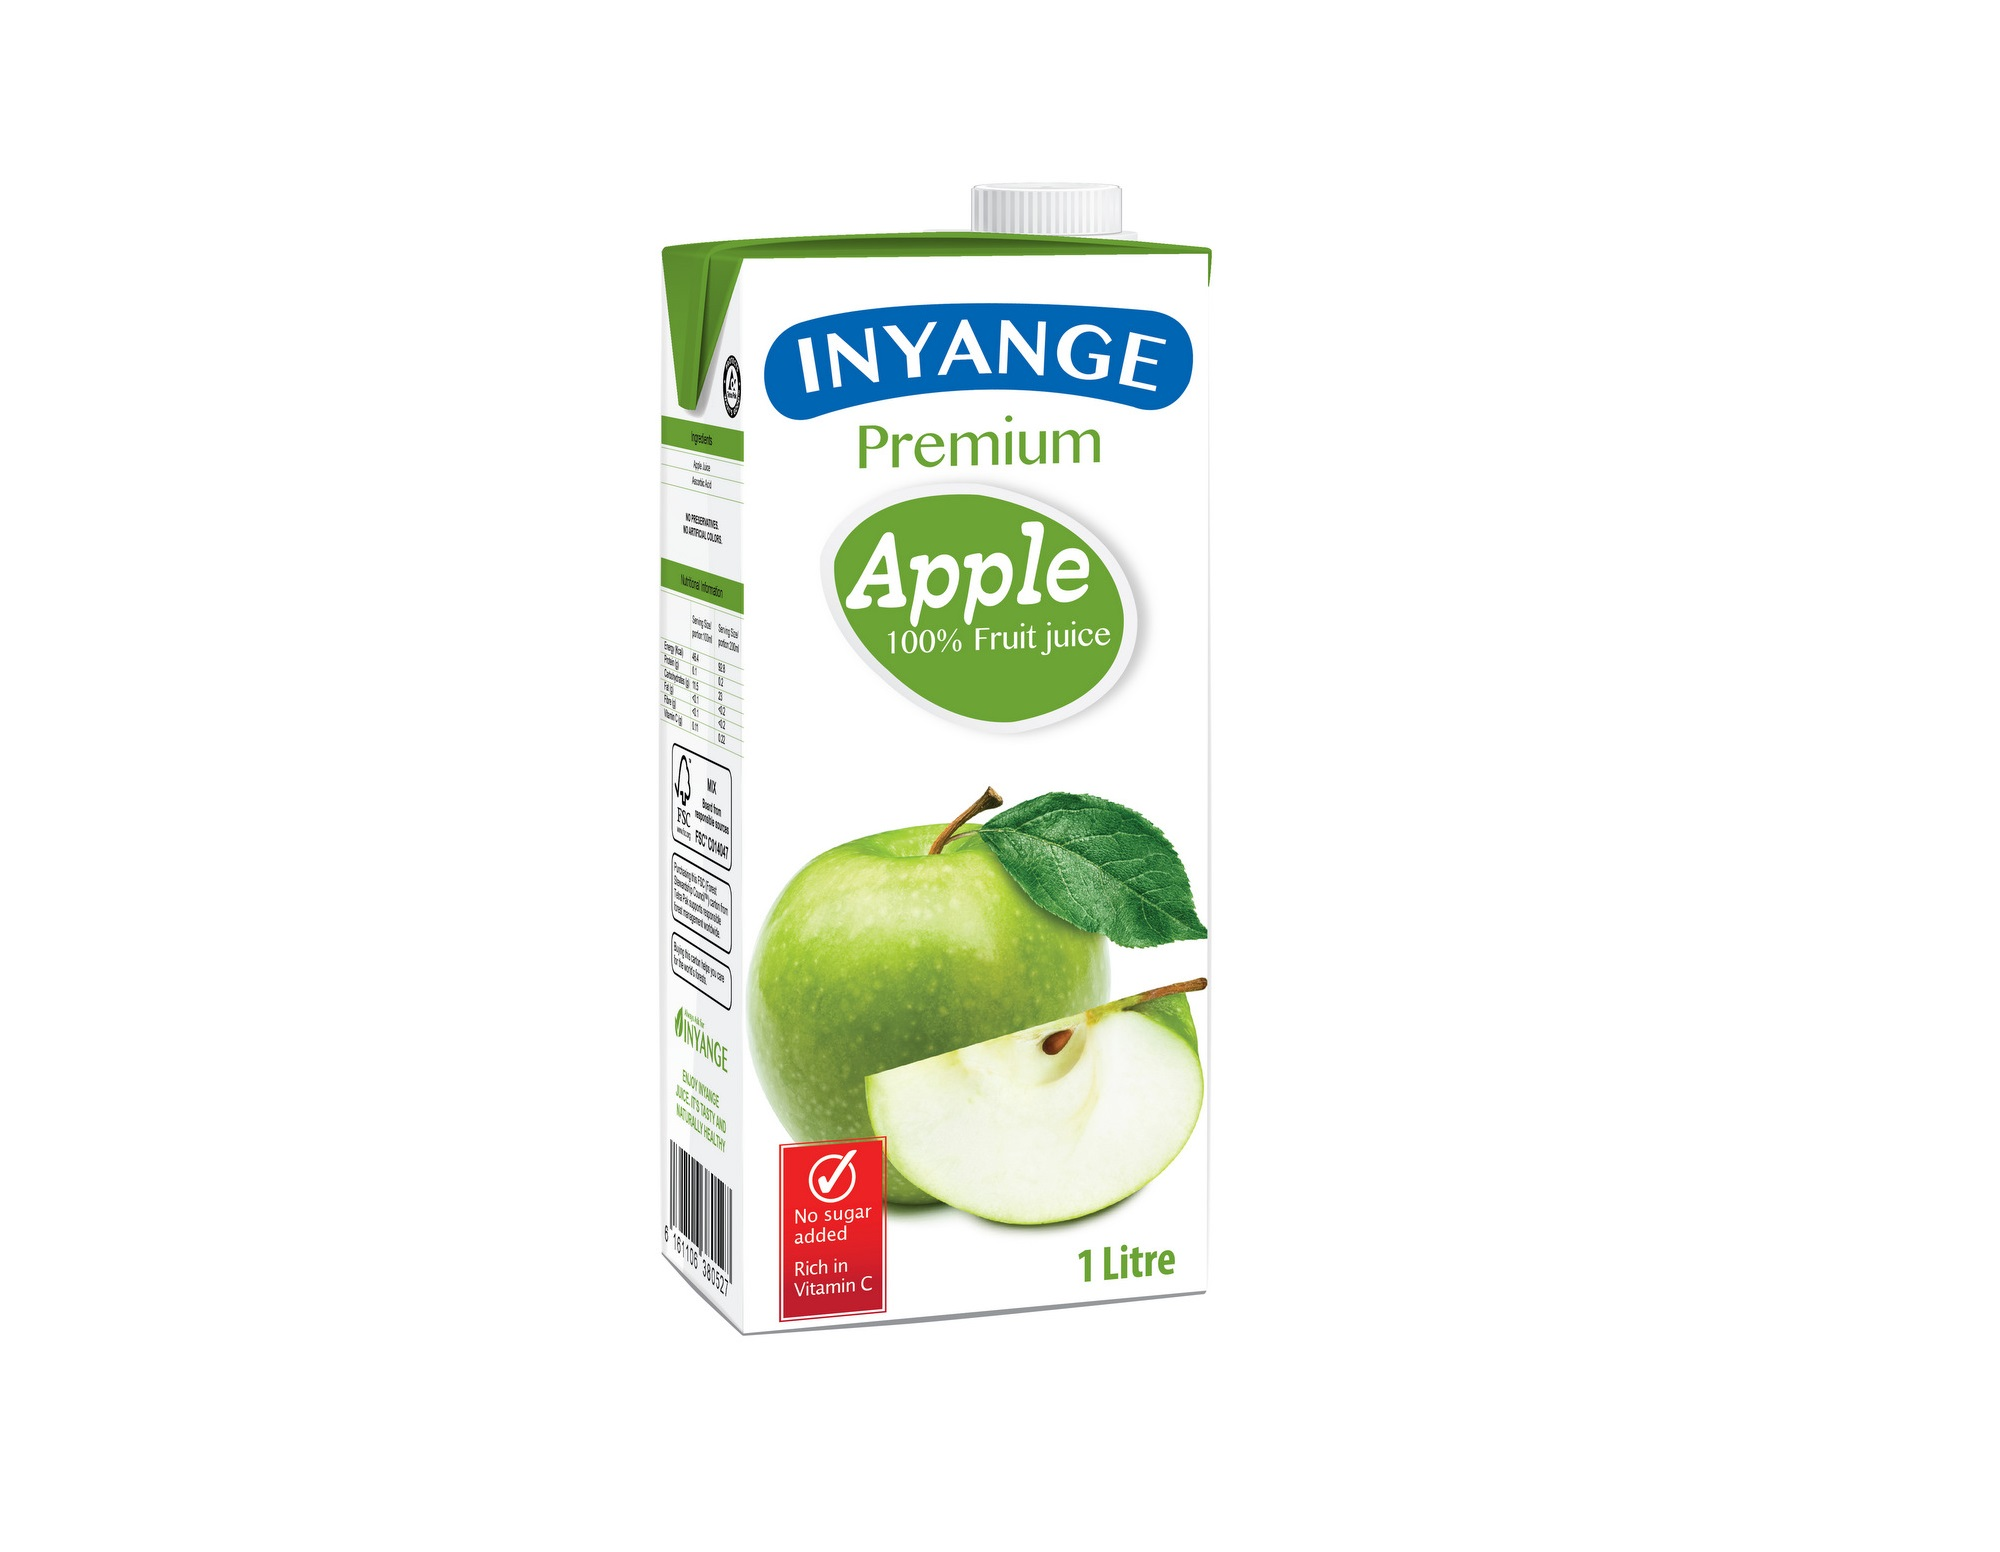 Juice Apple, Mango, Passion Price: 2000 Rwf Delivery Fees: 1000 Rwf